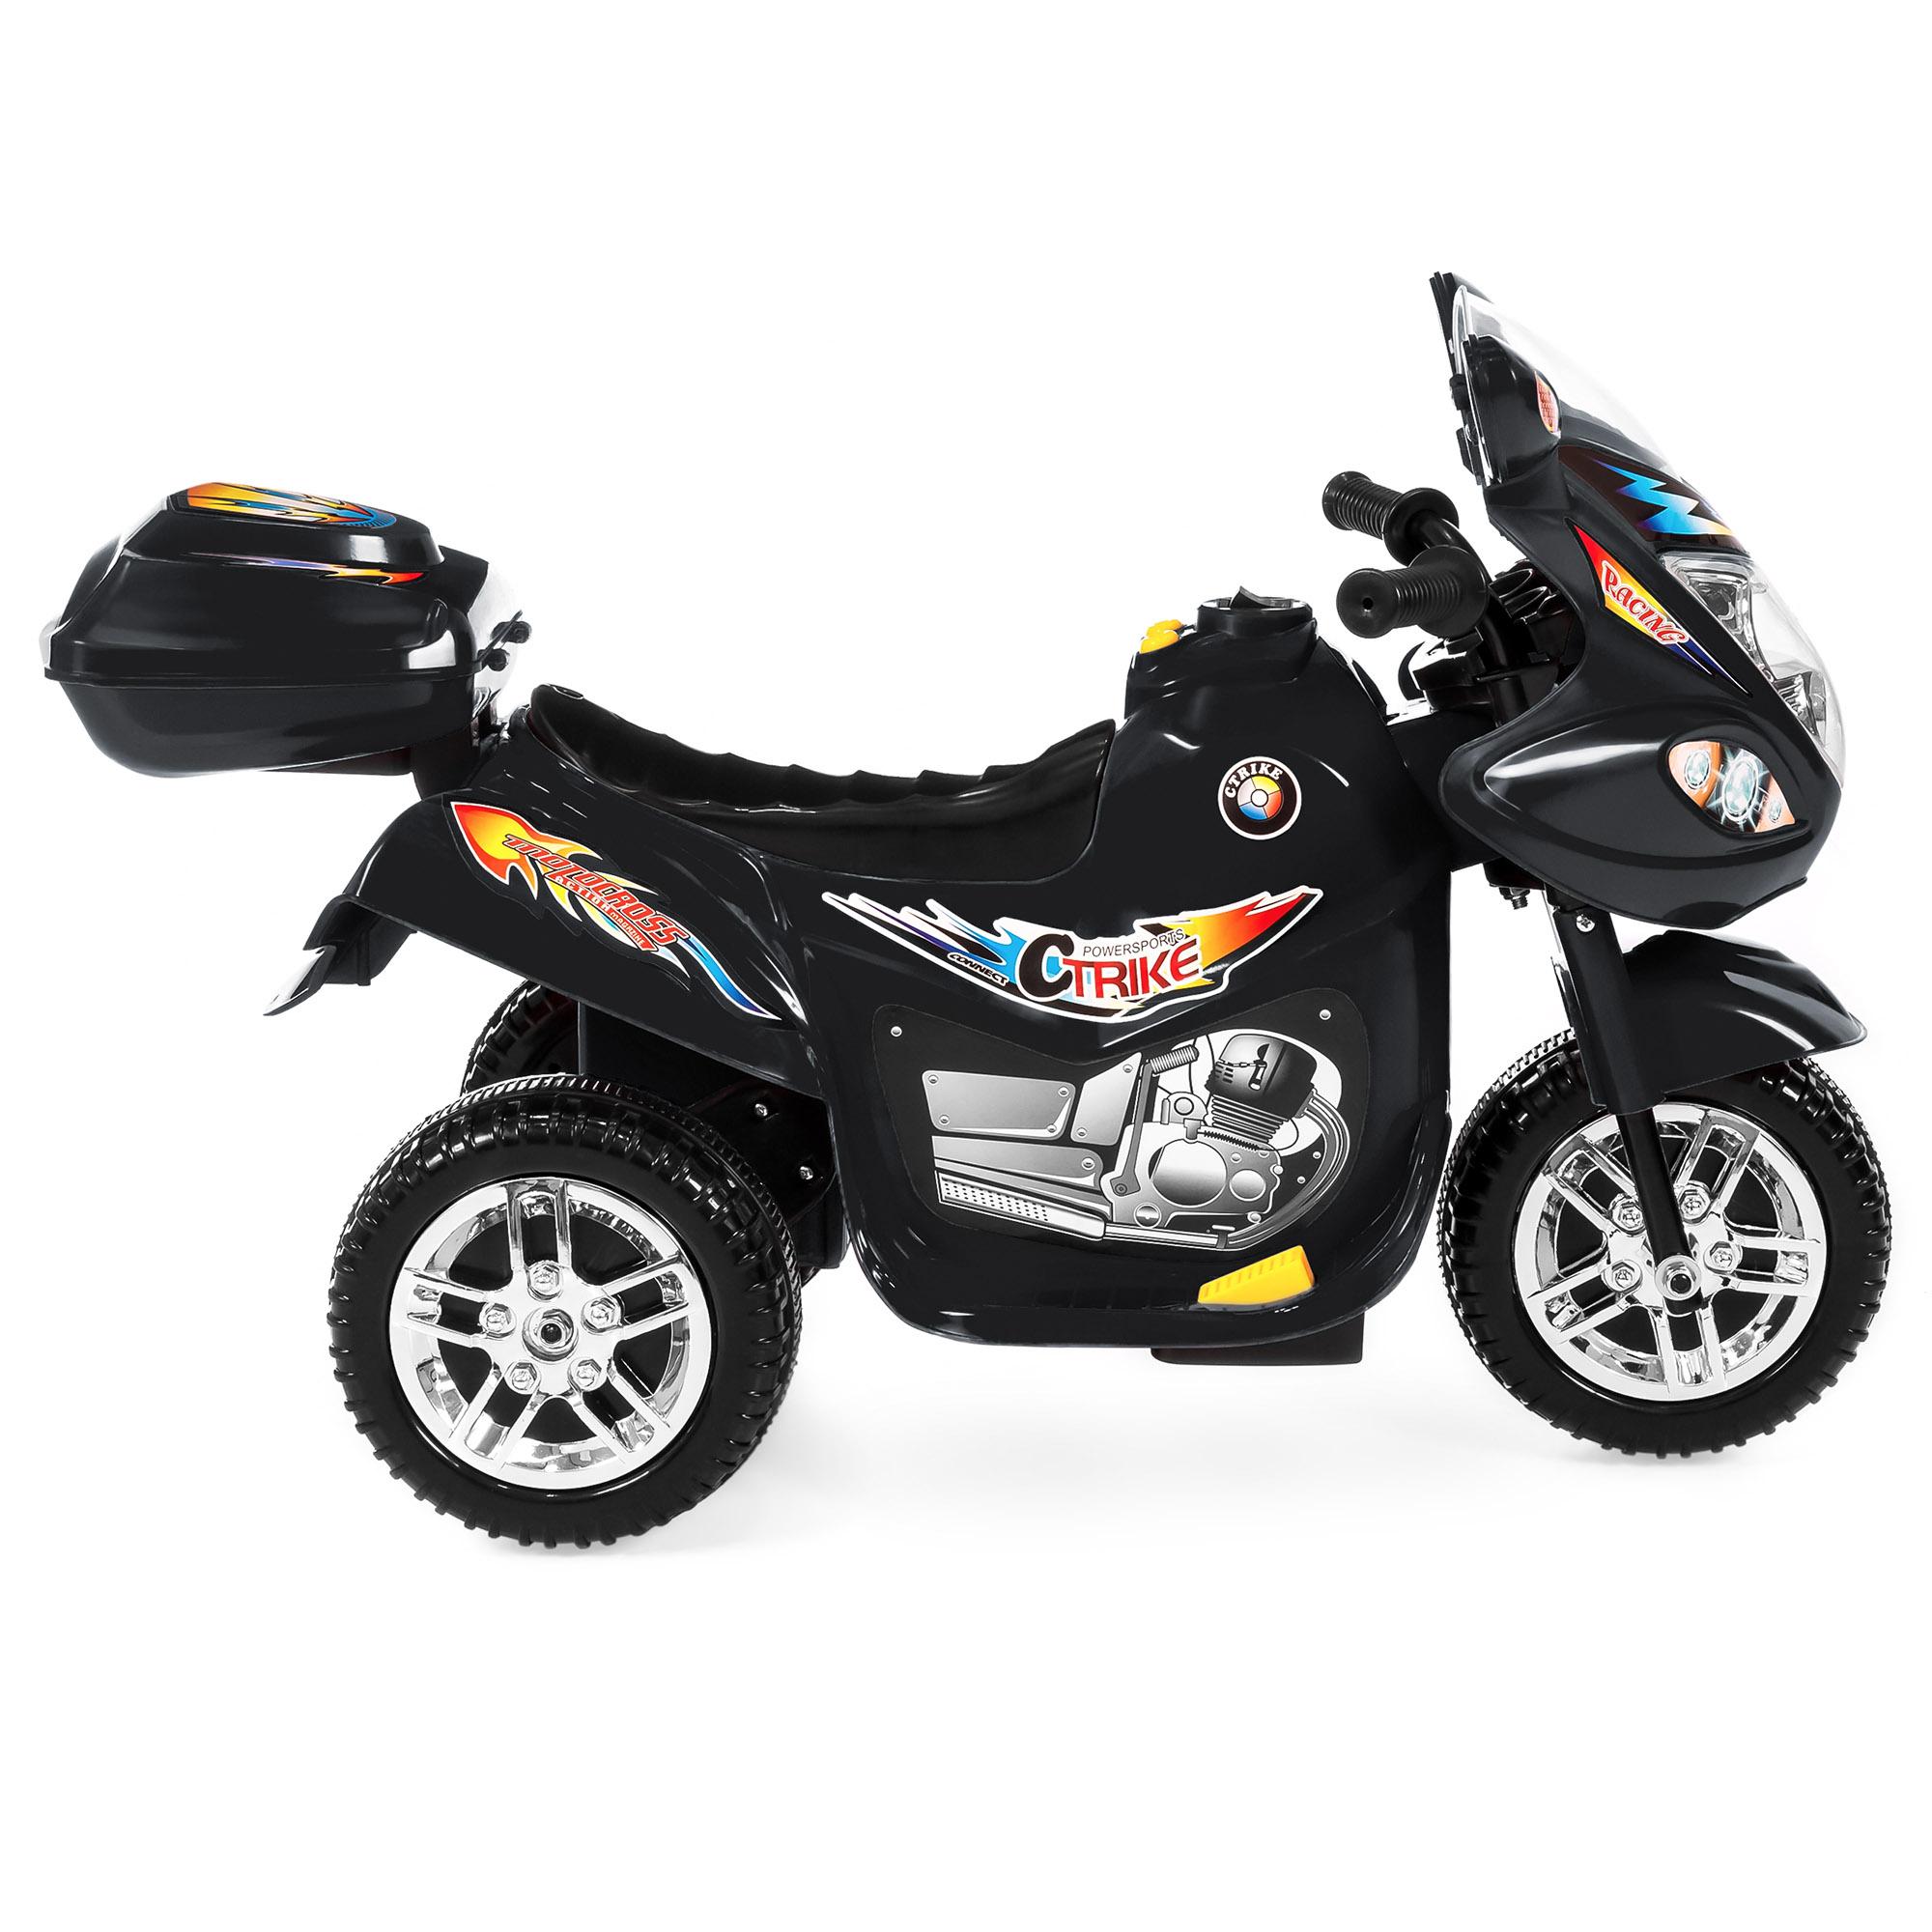 BCP-6V-Kids-3-Wheel-Motorcycle-Ride-On-Toy-w-LED-Lights-Music-Storage thumbnail 9